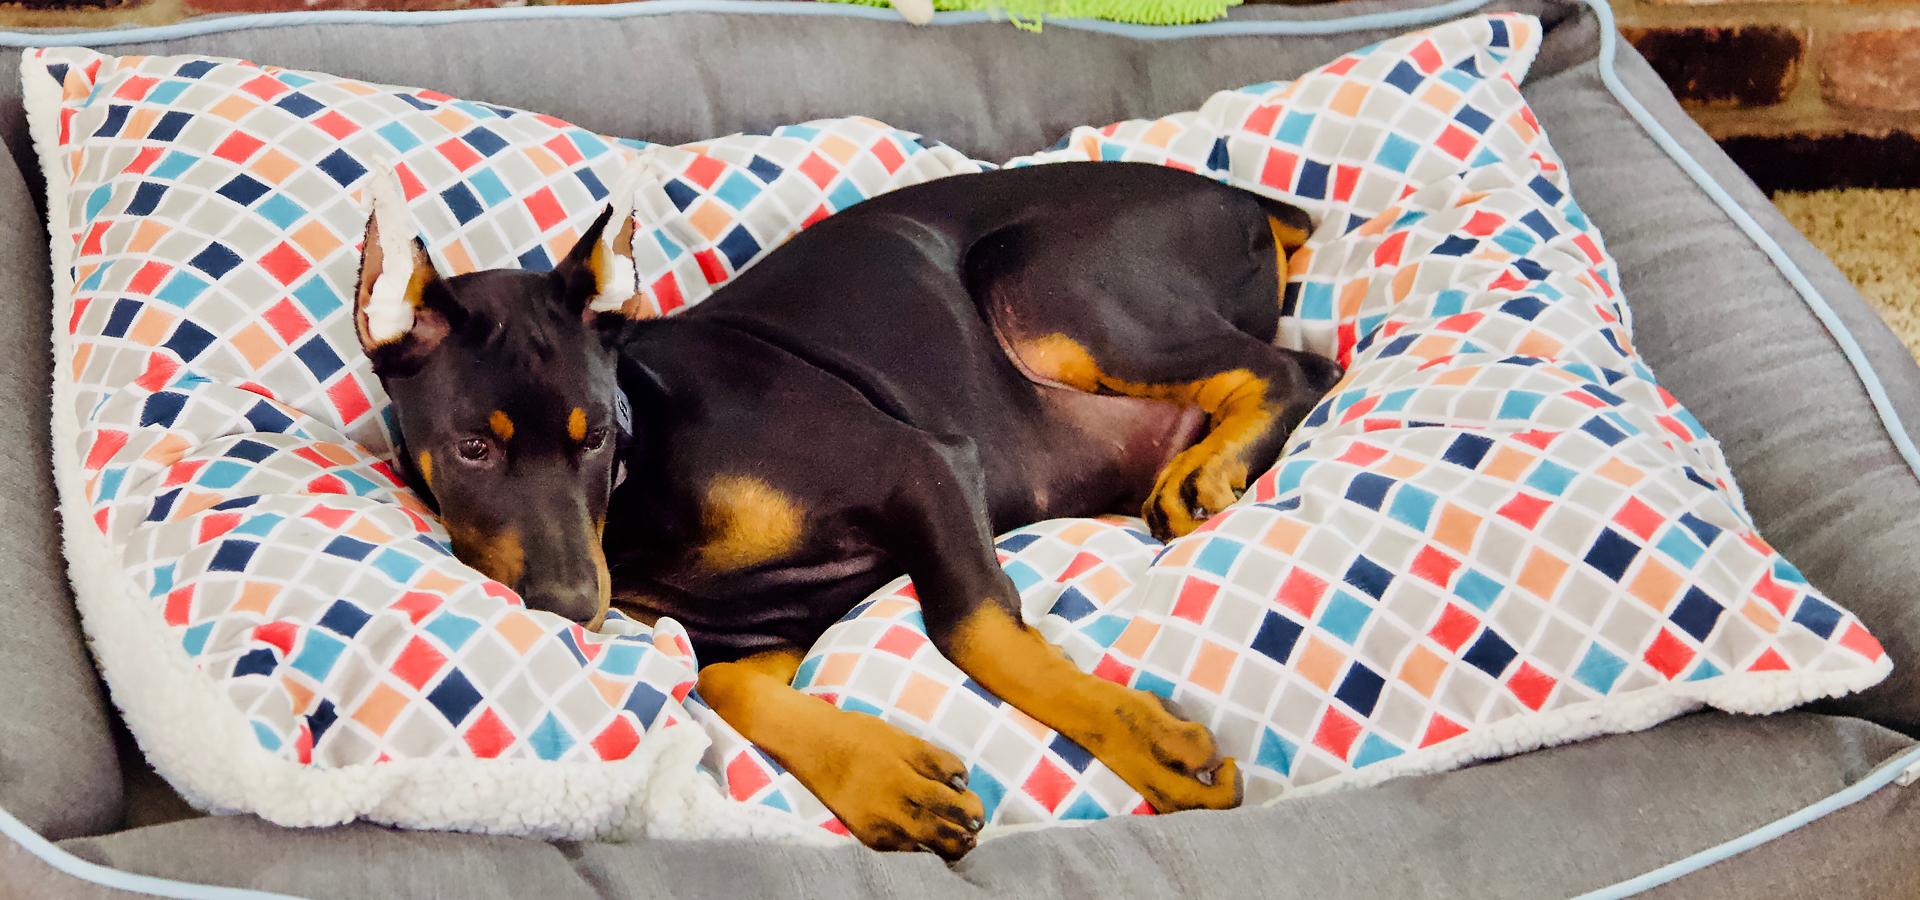 Atlas earned back his beds.